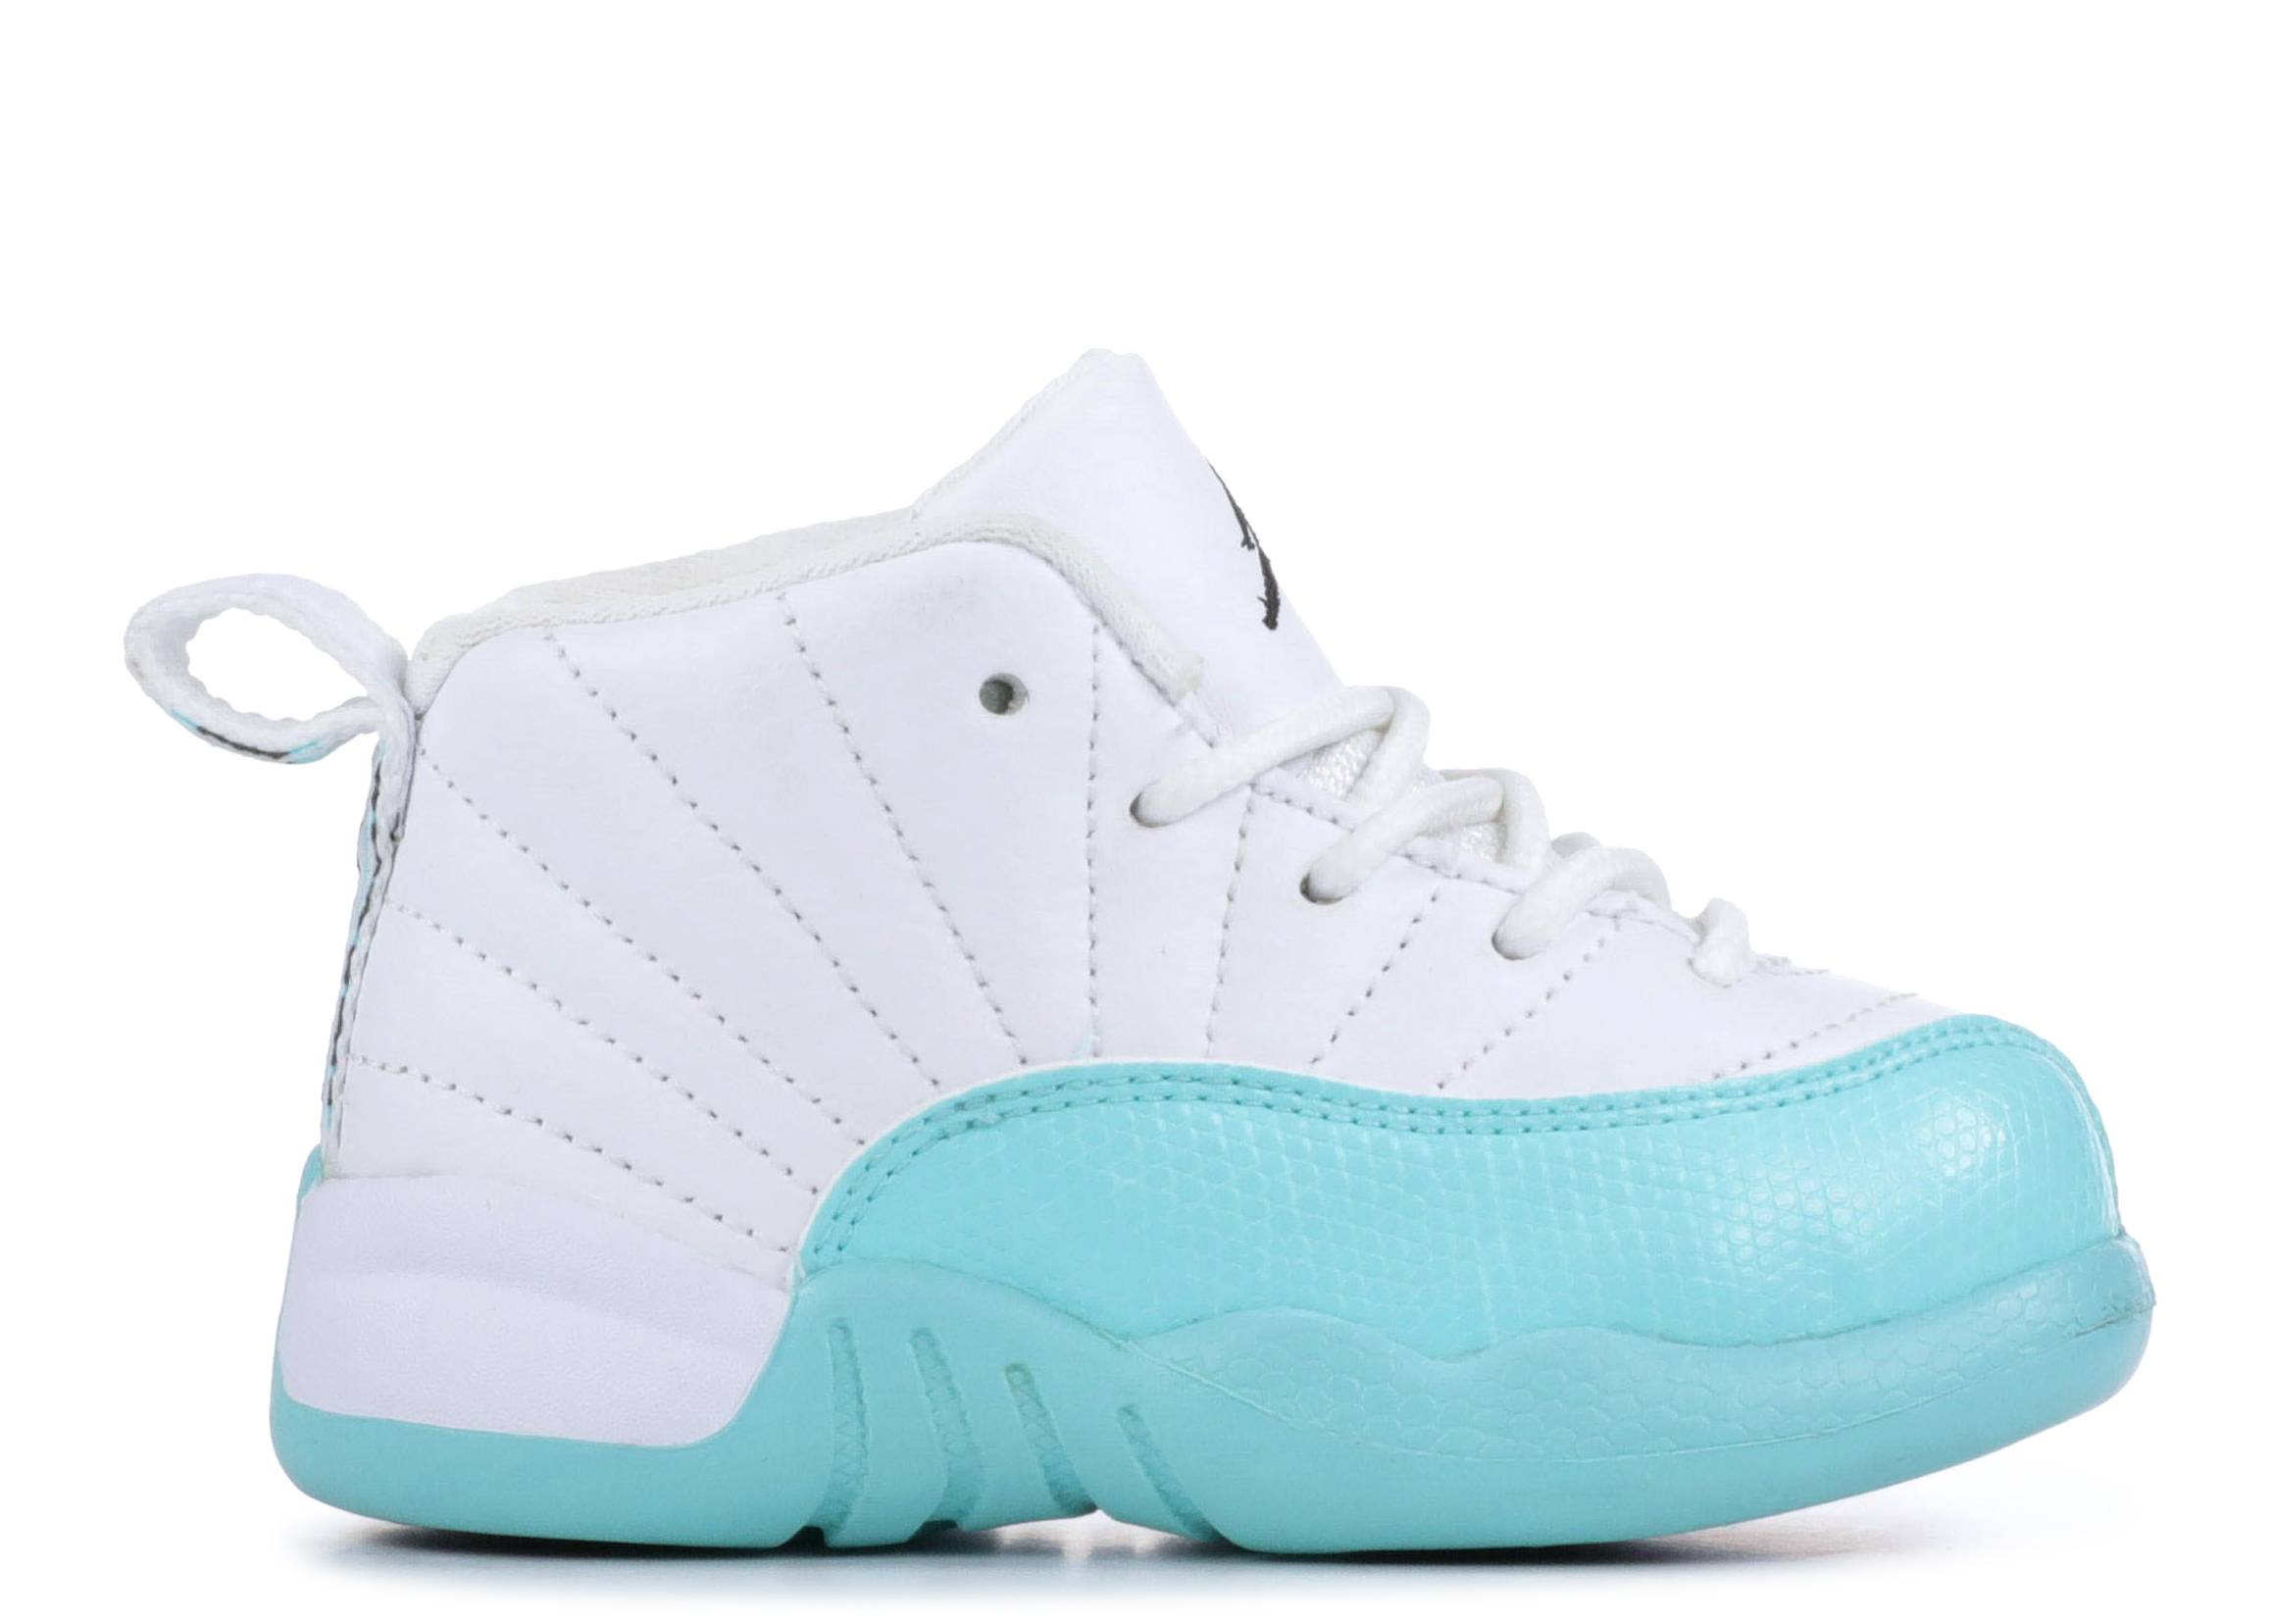 pick up 3190b 01a6f Air Jordan 12 (XII) Shoes - Nike | Flight Club